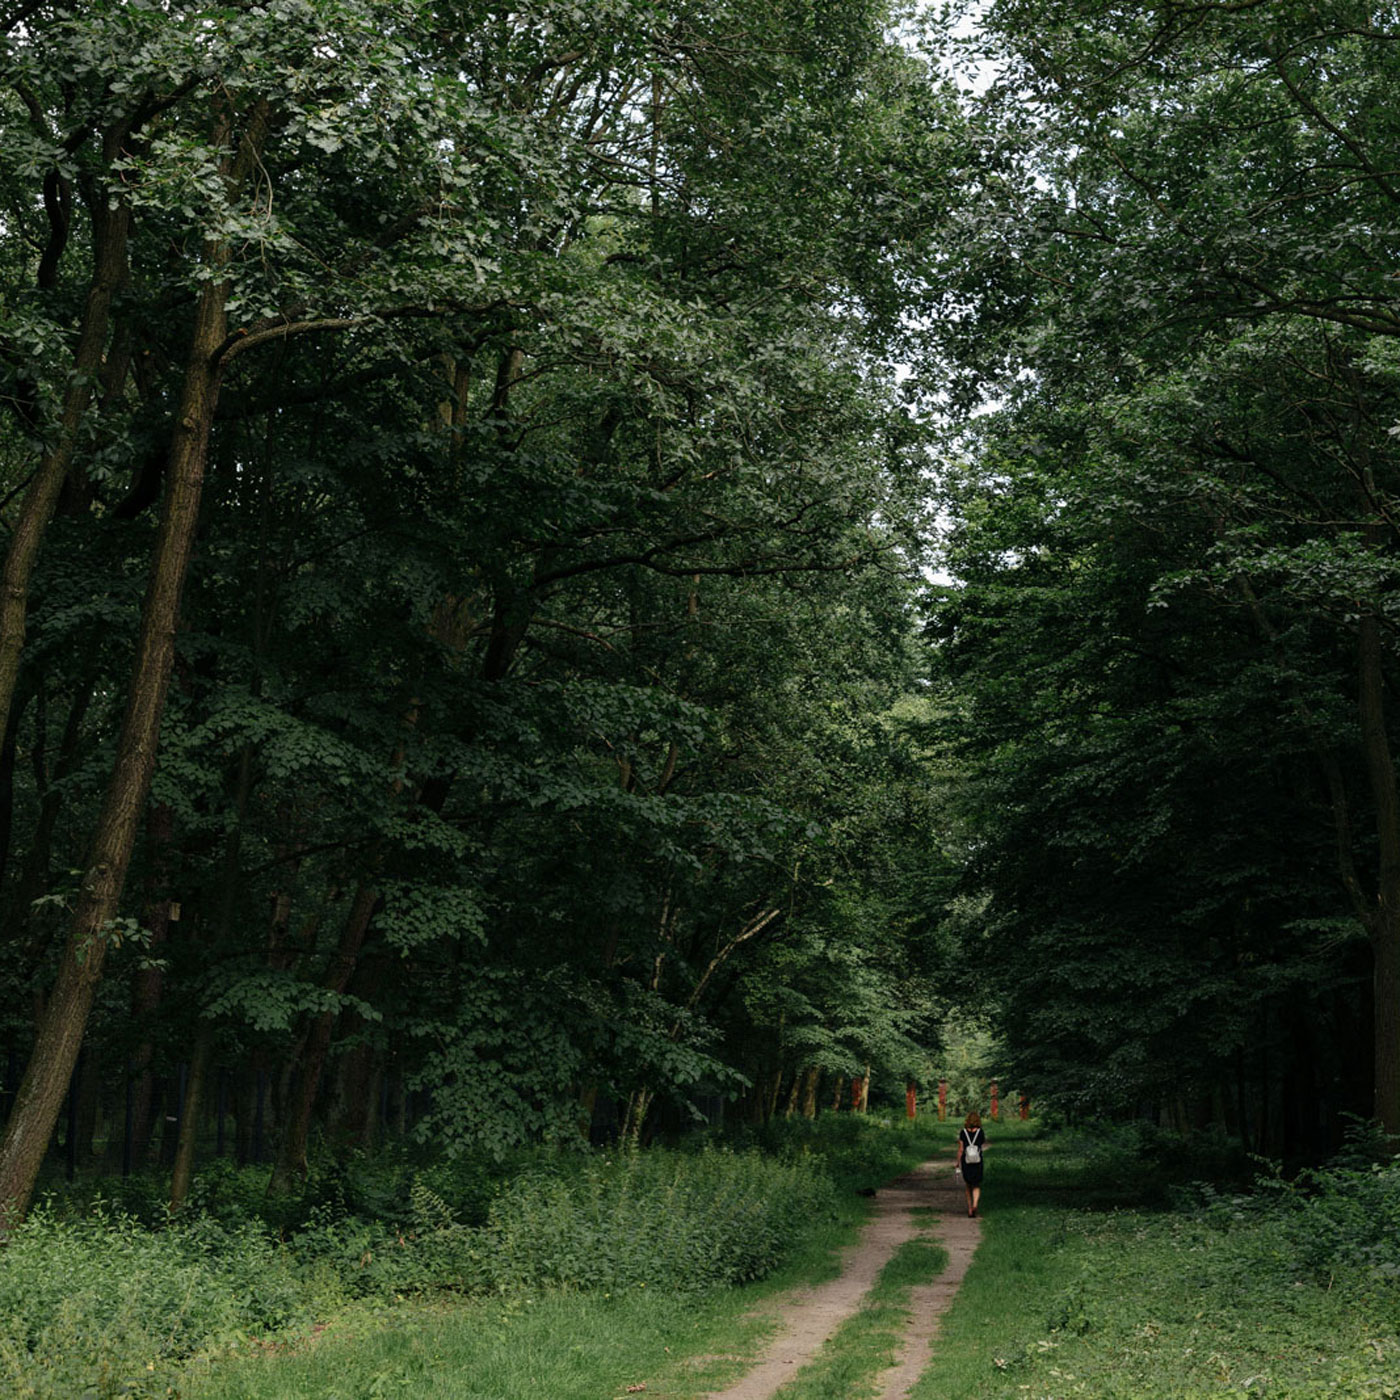 Ausflug mit Kindern in Berlin: Einsame Waldwege // HIMBEER